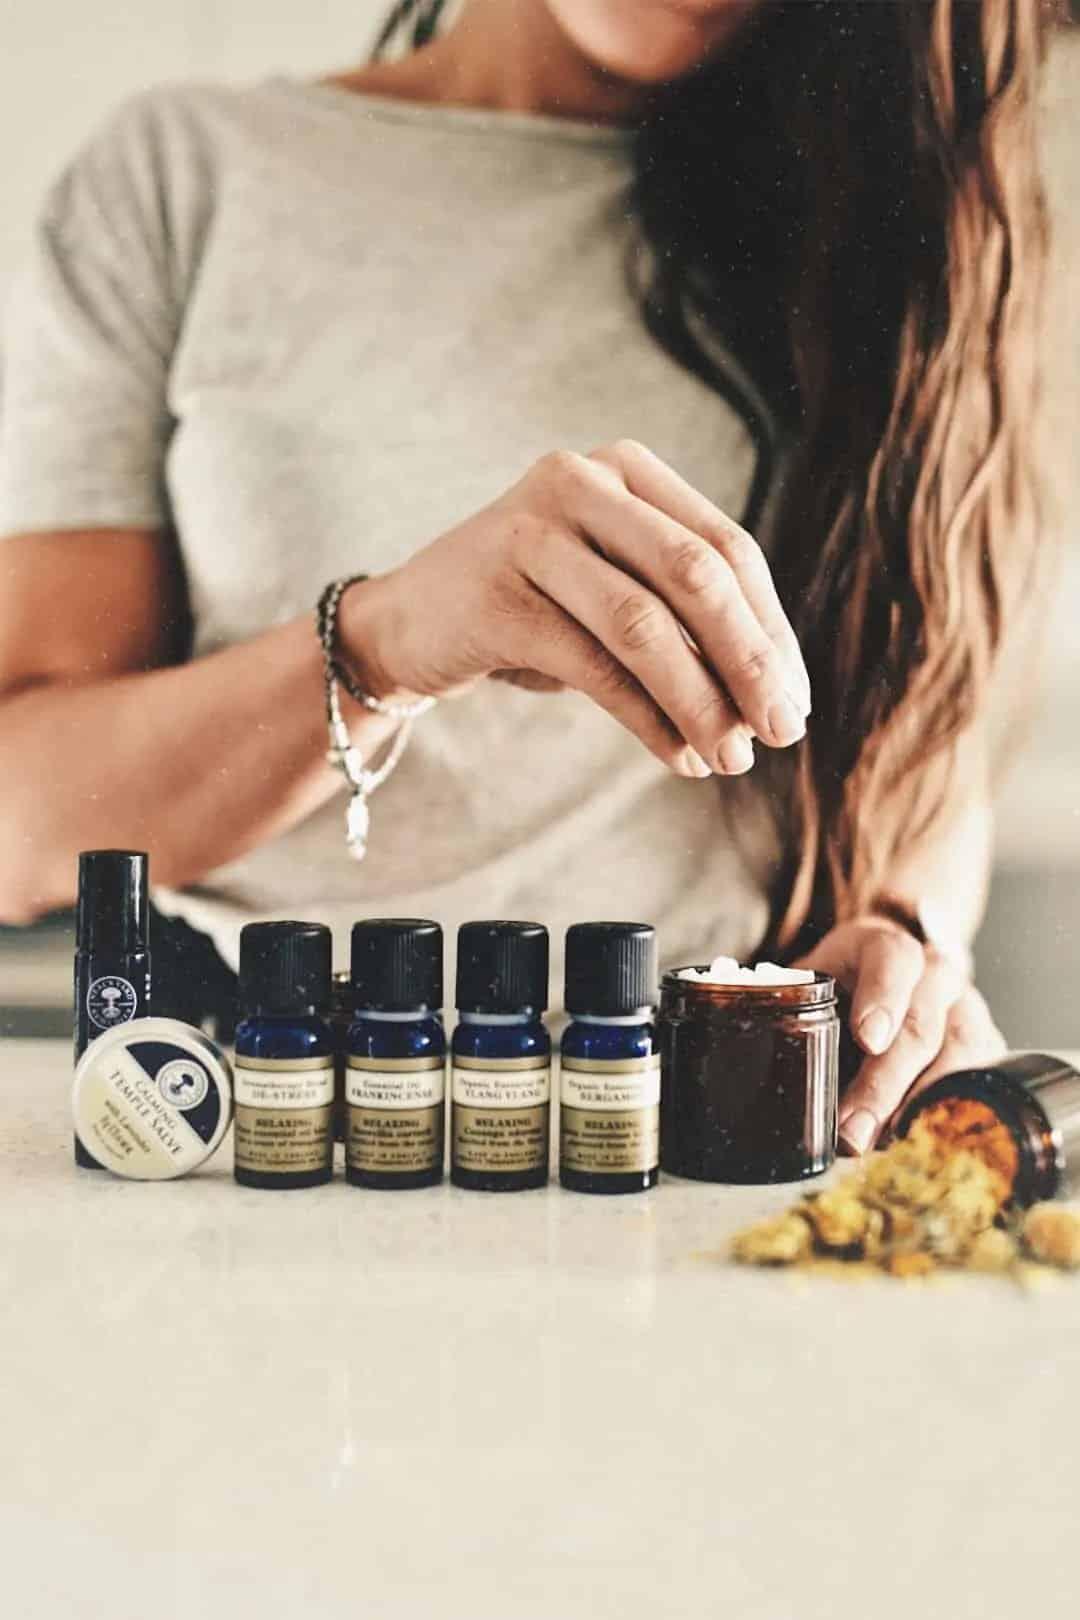 DIY Aromatherapy Bath Oil